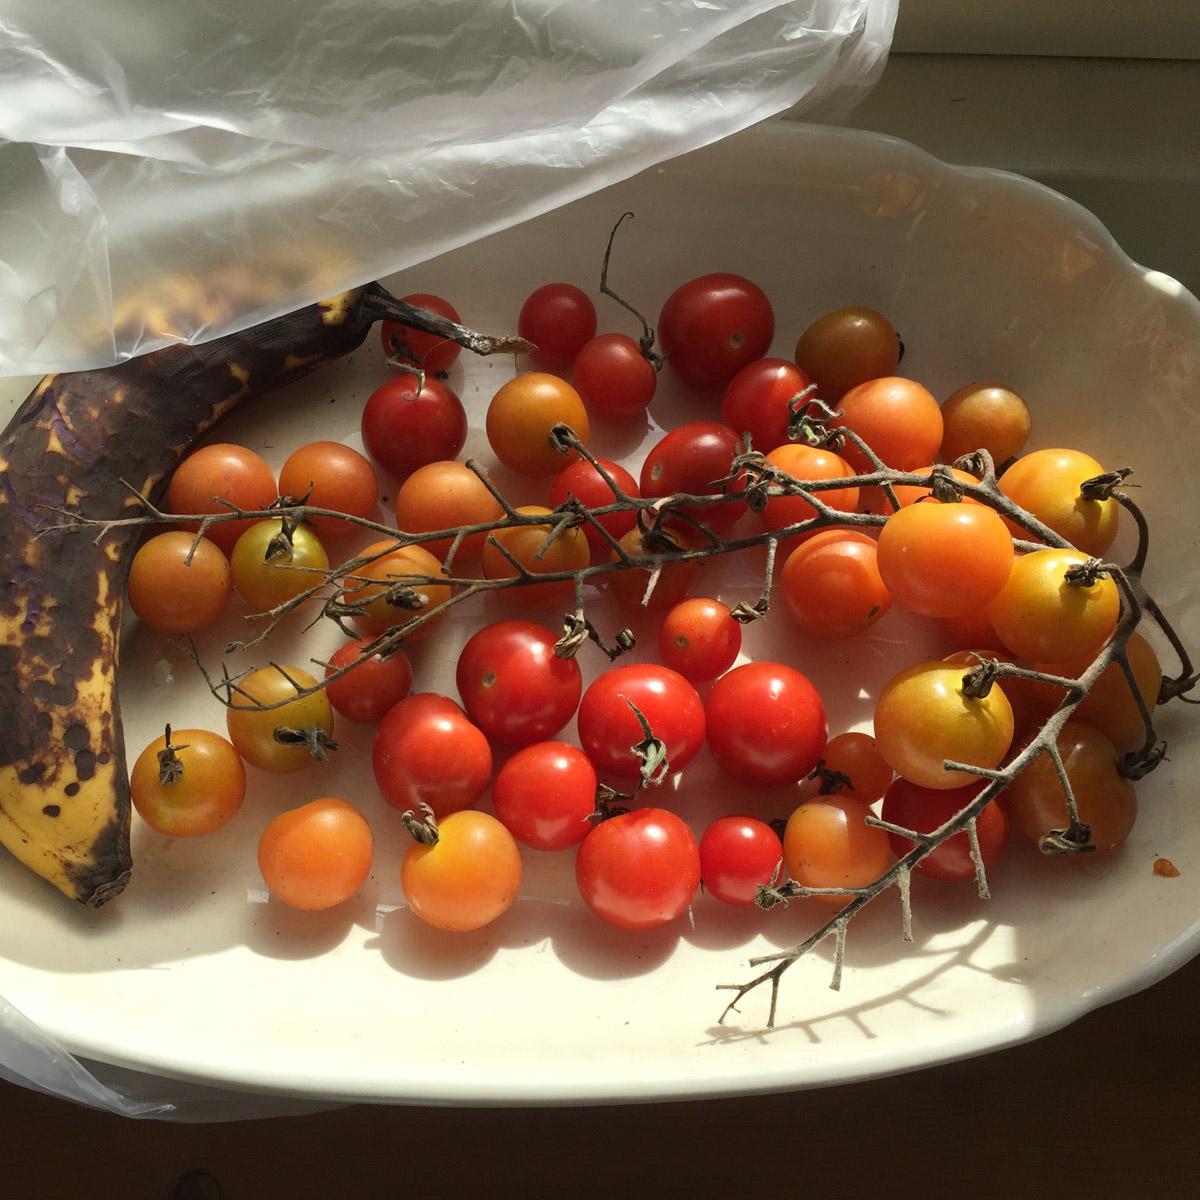 tomato-disease-action9.jpg